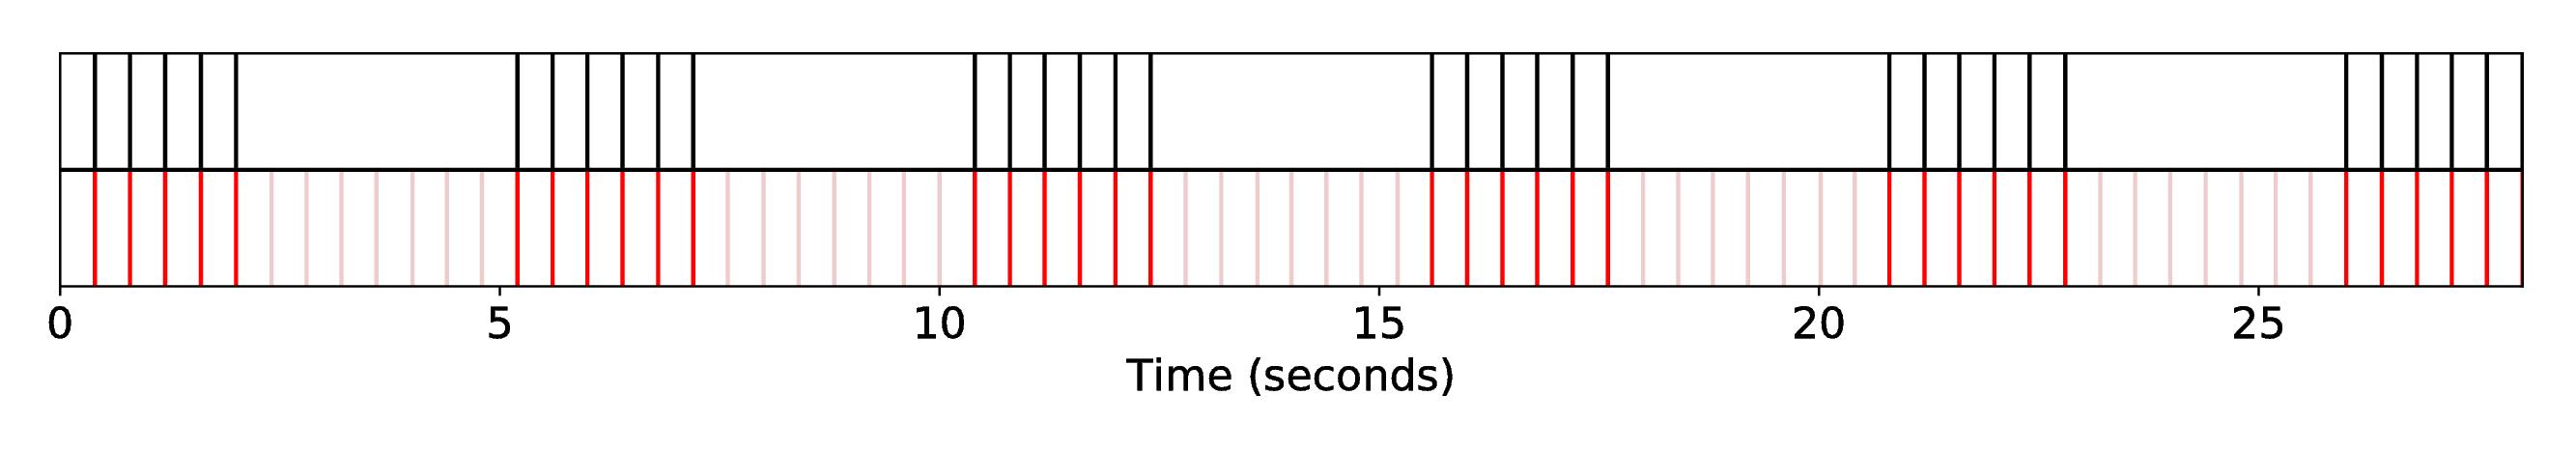 DP1_INT1_R-Syn-CoGa__S-Bach__SequenceAlignment